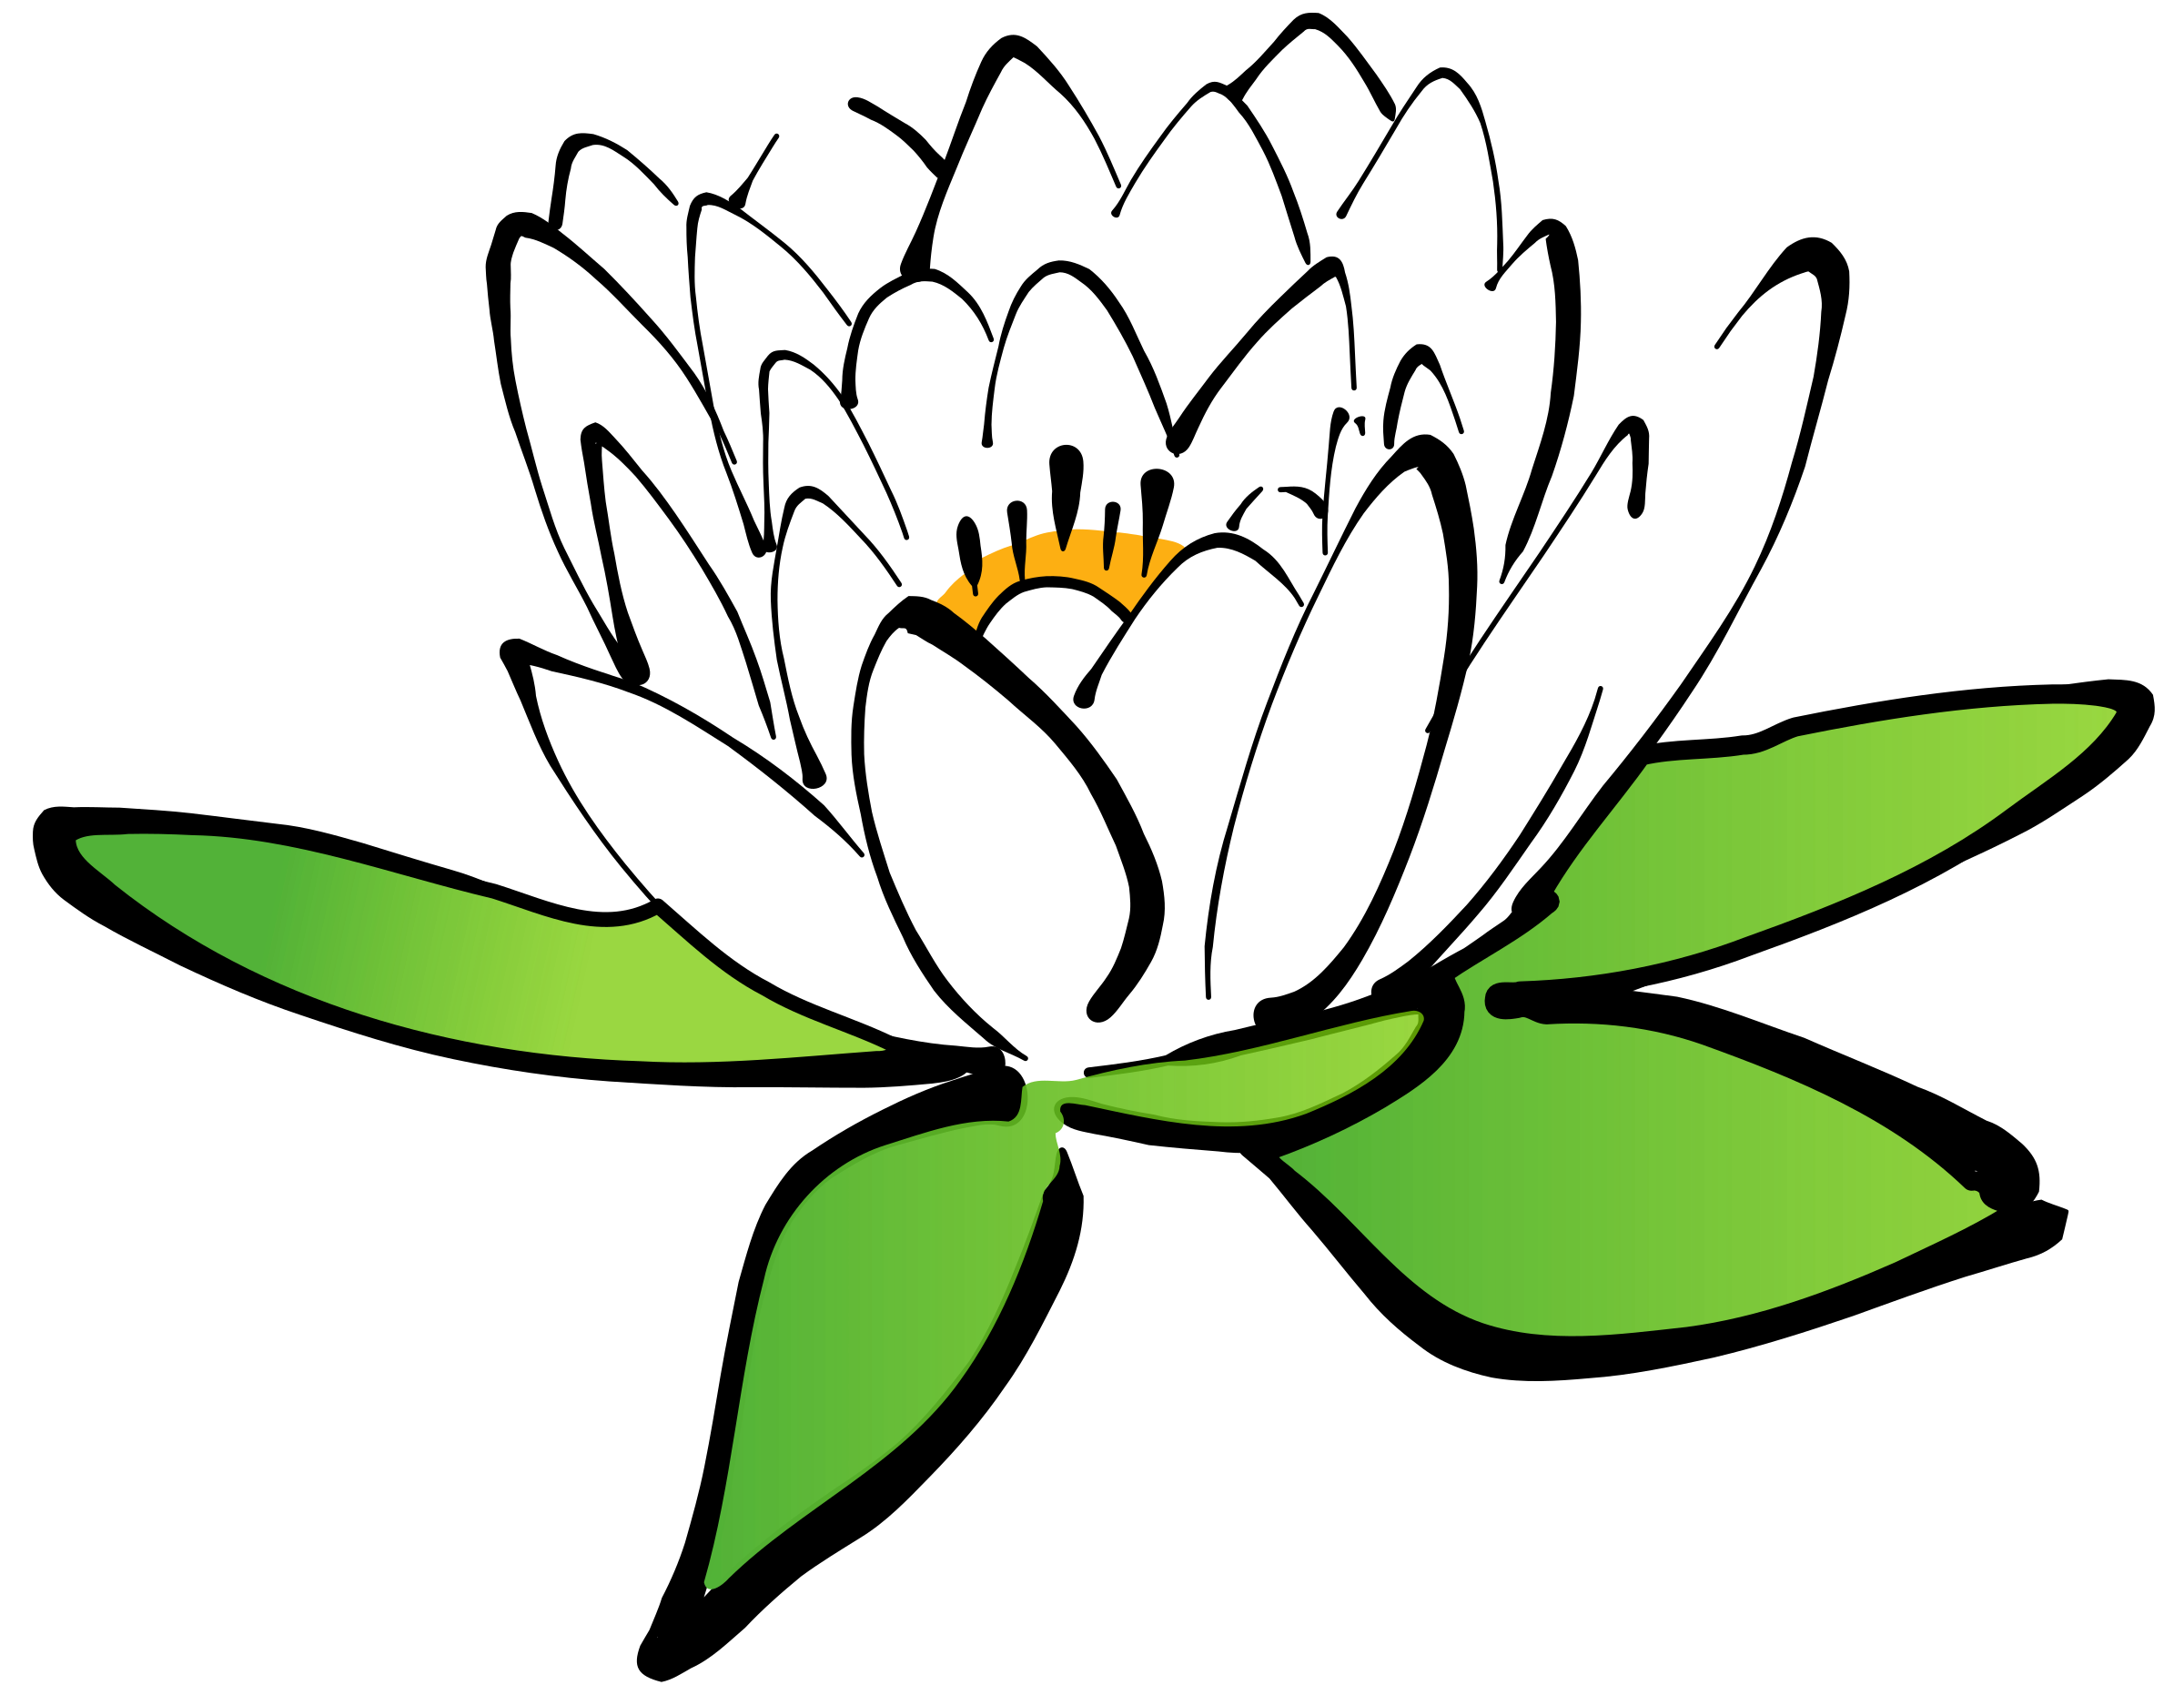 Lotus clipart olu. Blue flower nelum pencil